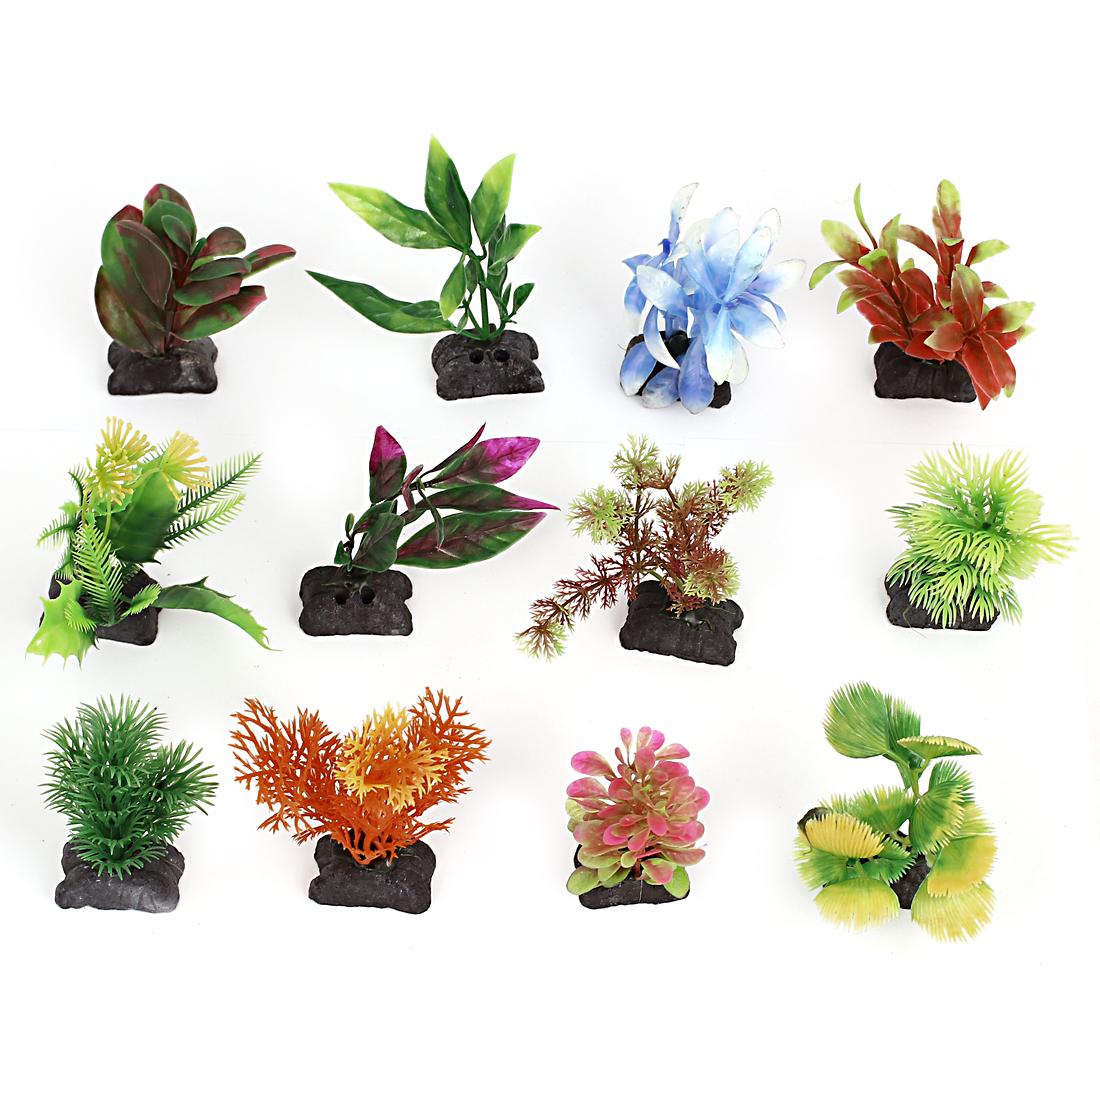 Aquarium Fish Tank Plastic Artificial Flower Grass Water Plant Decoration 12 PCS